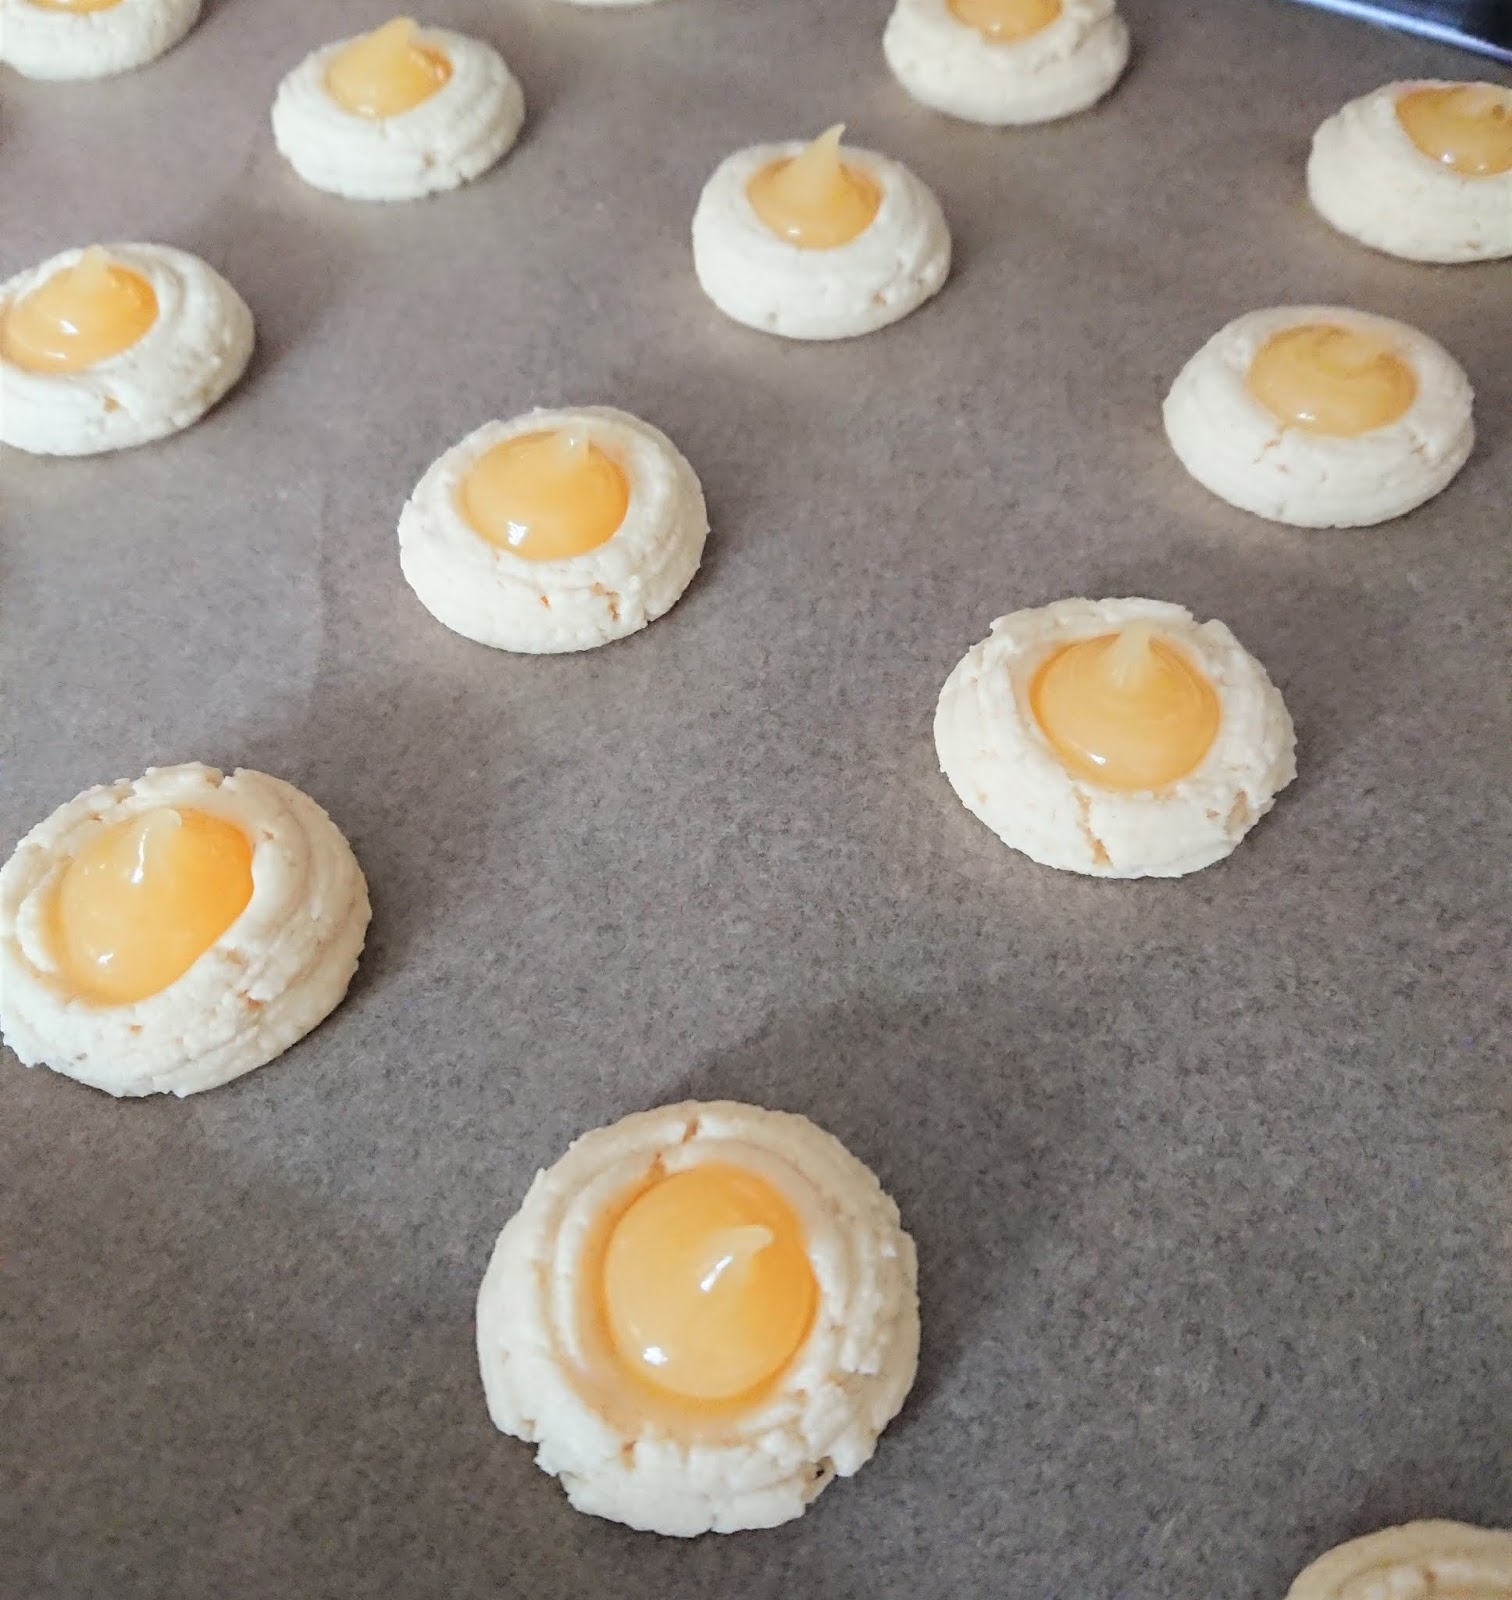 Unicorn Cakes: Lemon dimple cookies